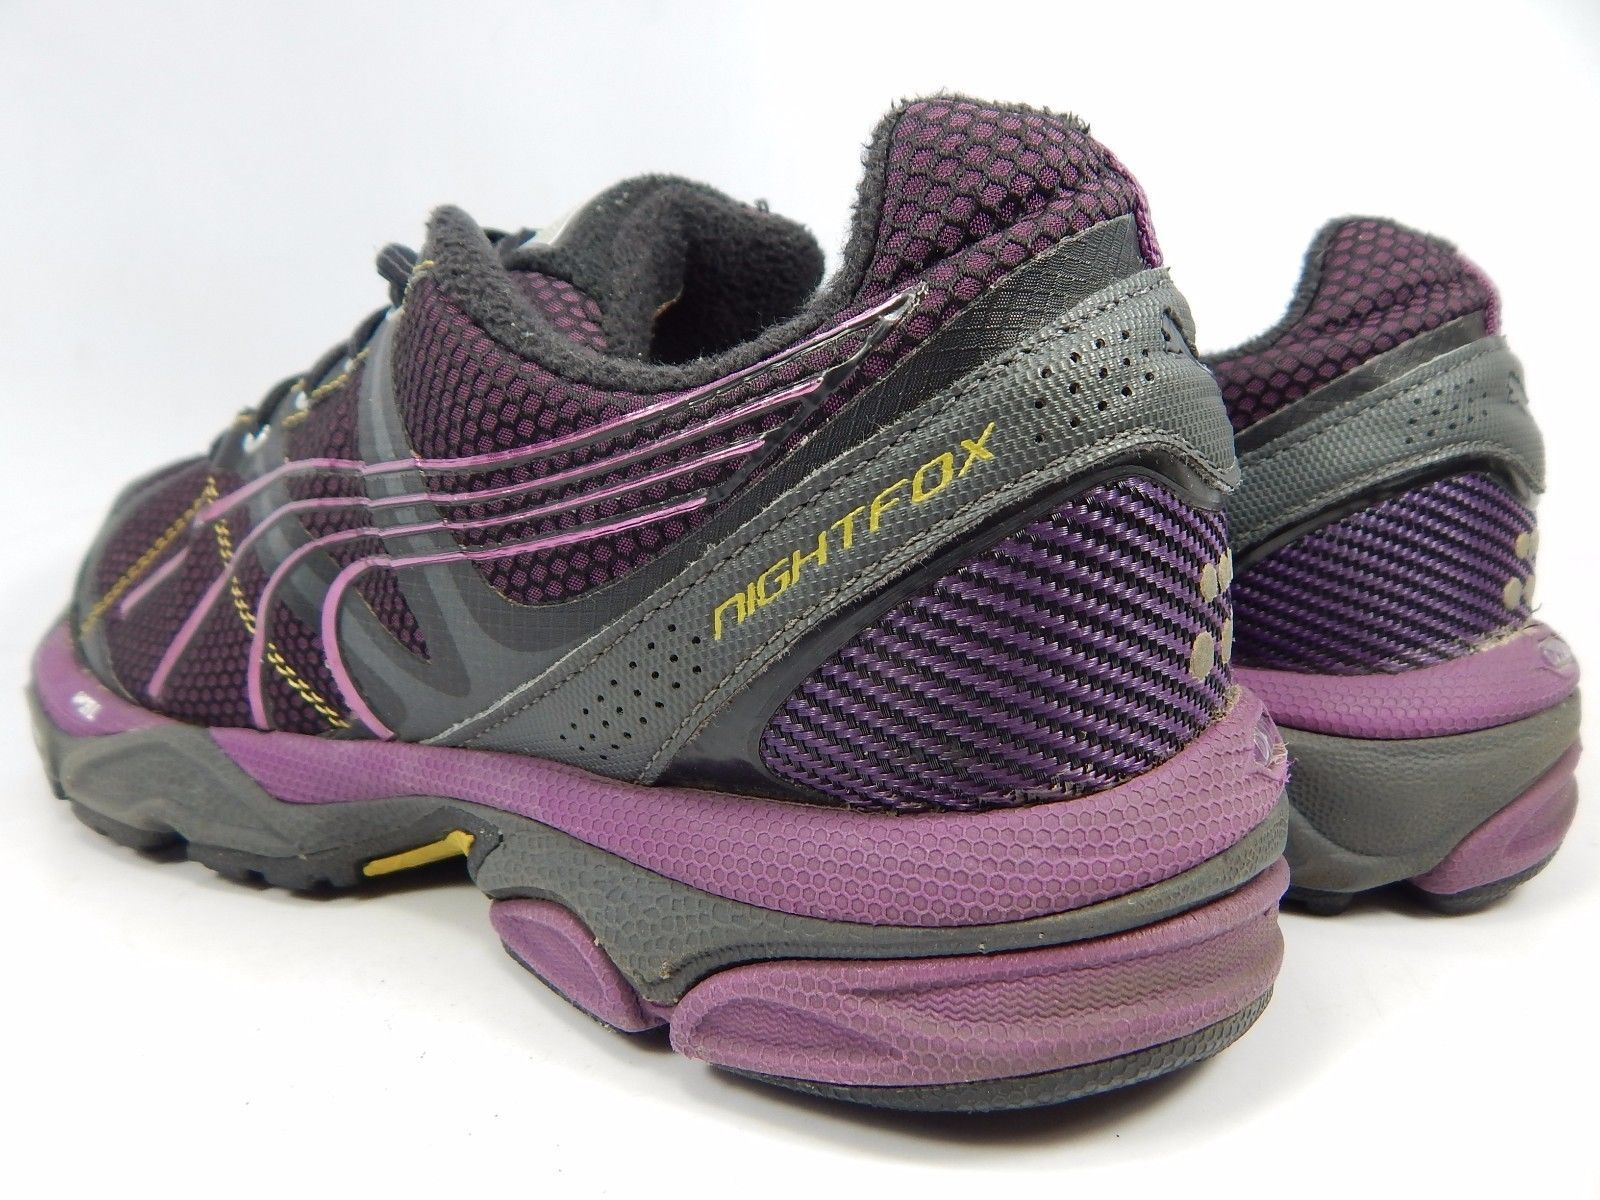 Puma NightFox TR Women's Trail Running Shoes Size US 9 M (B) EU 40 Black Purple